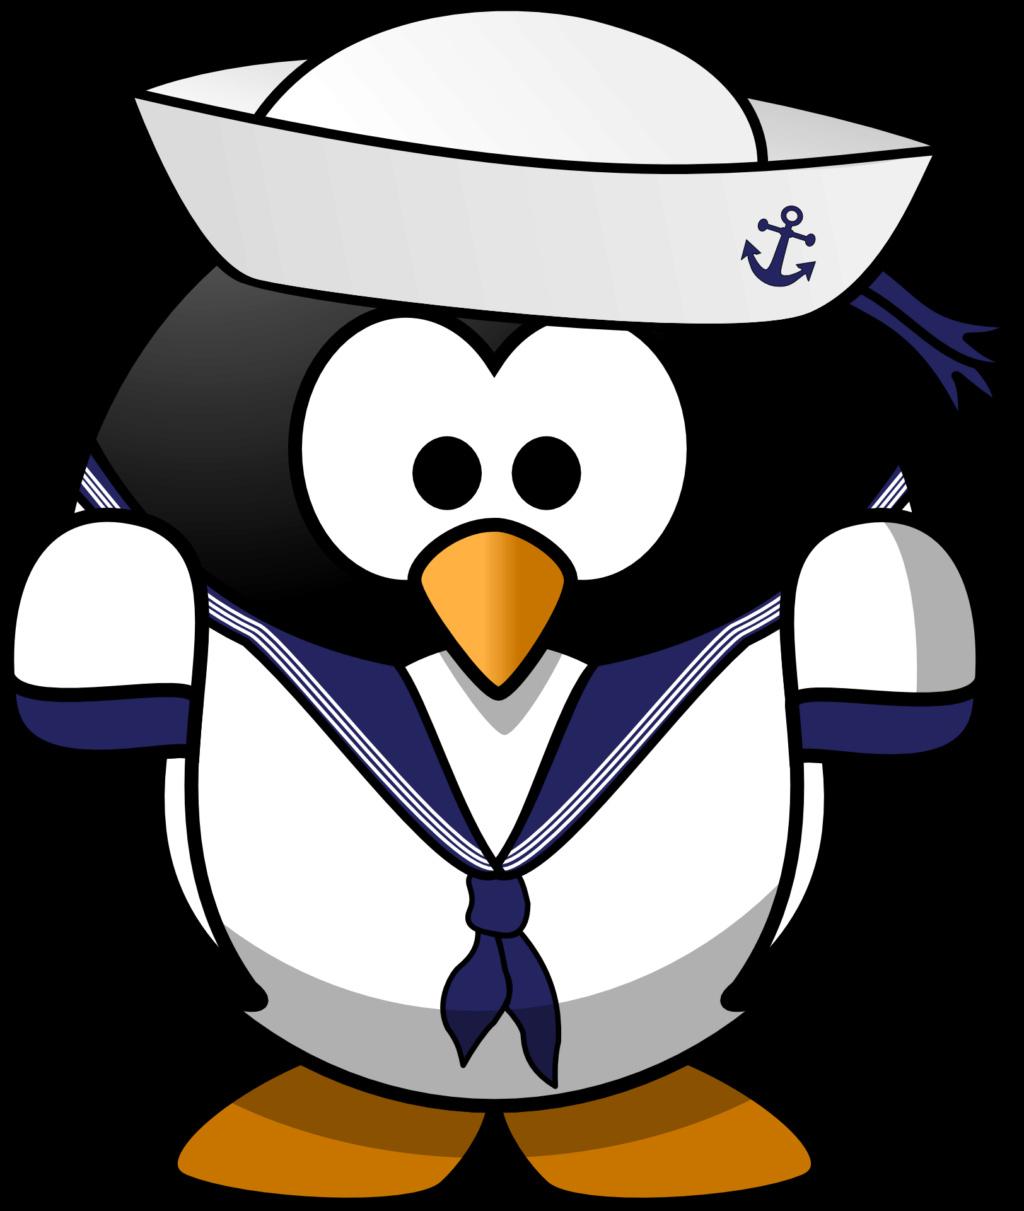 Путь капитана / мореплавателя / моряка 299a1610